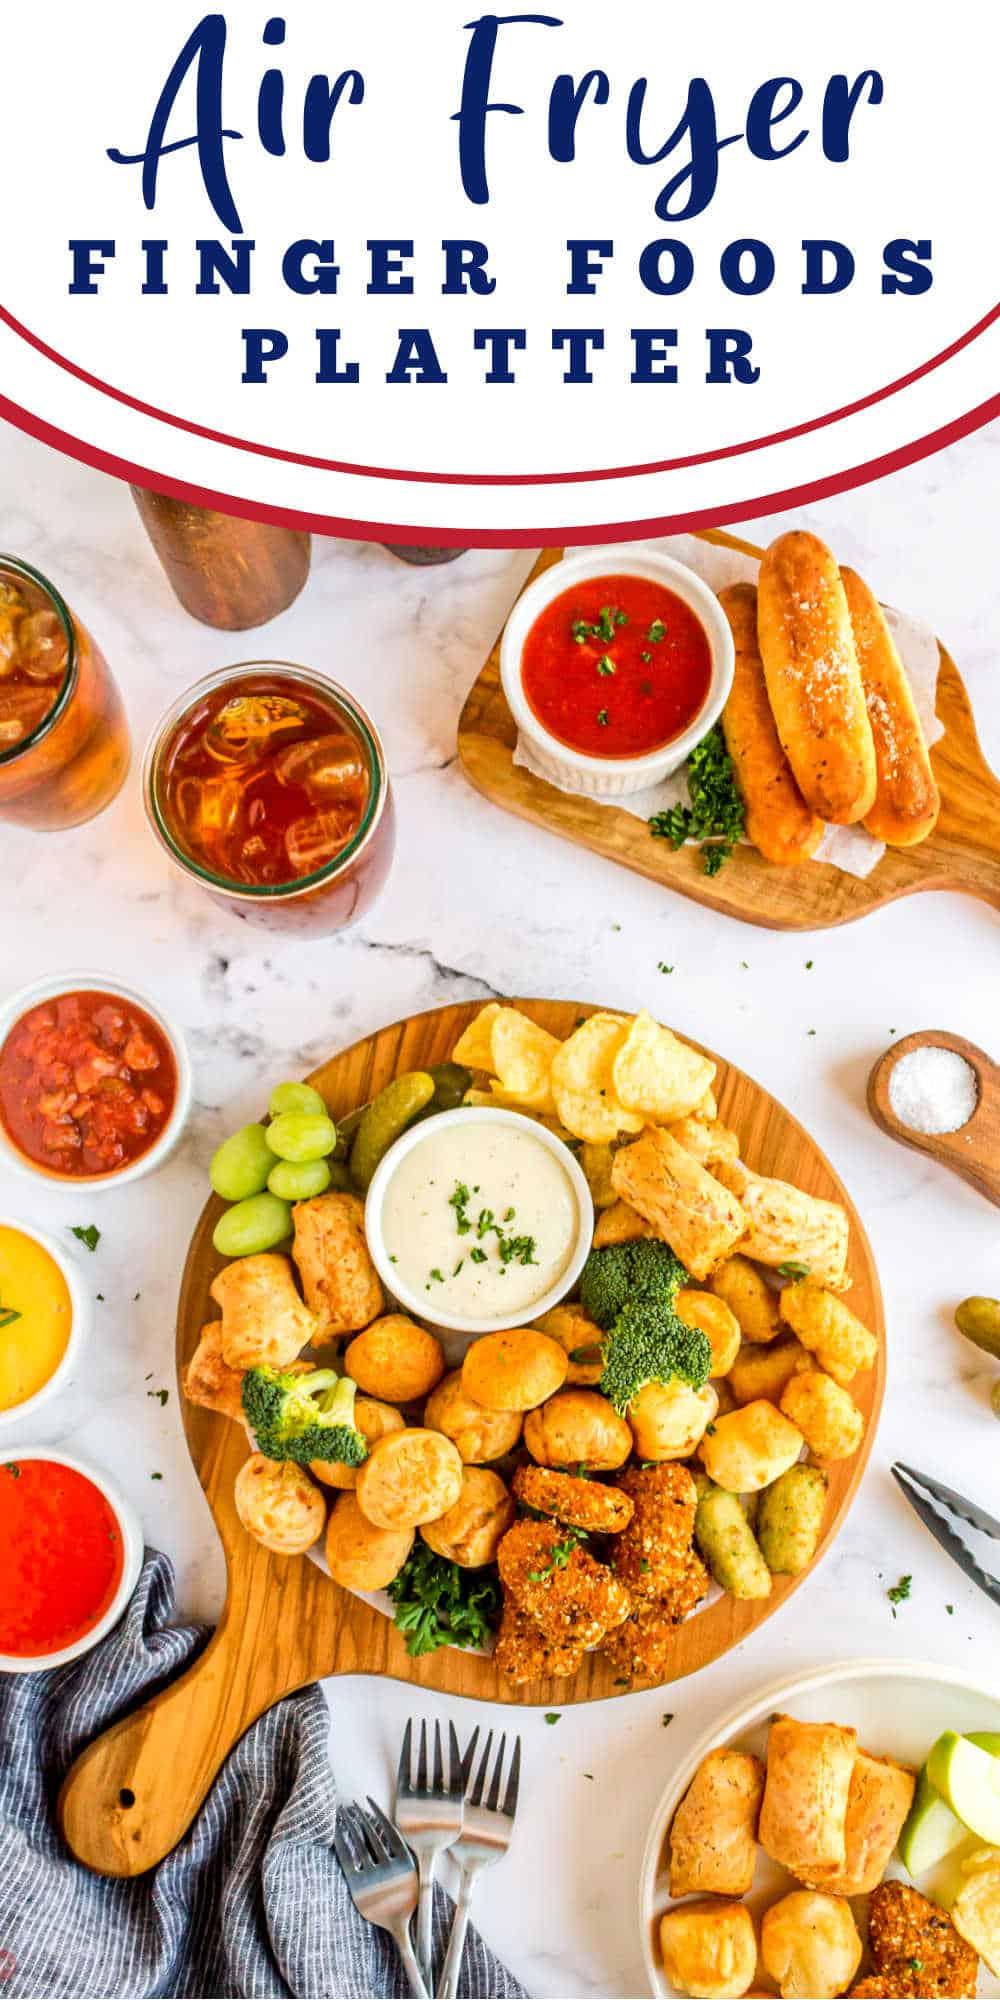 "platter of food with text ""air fryer finger foods platter"""